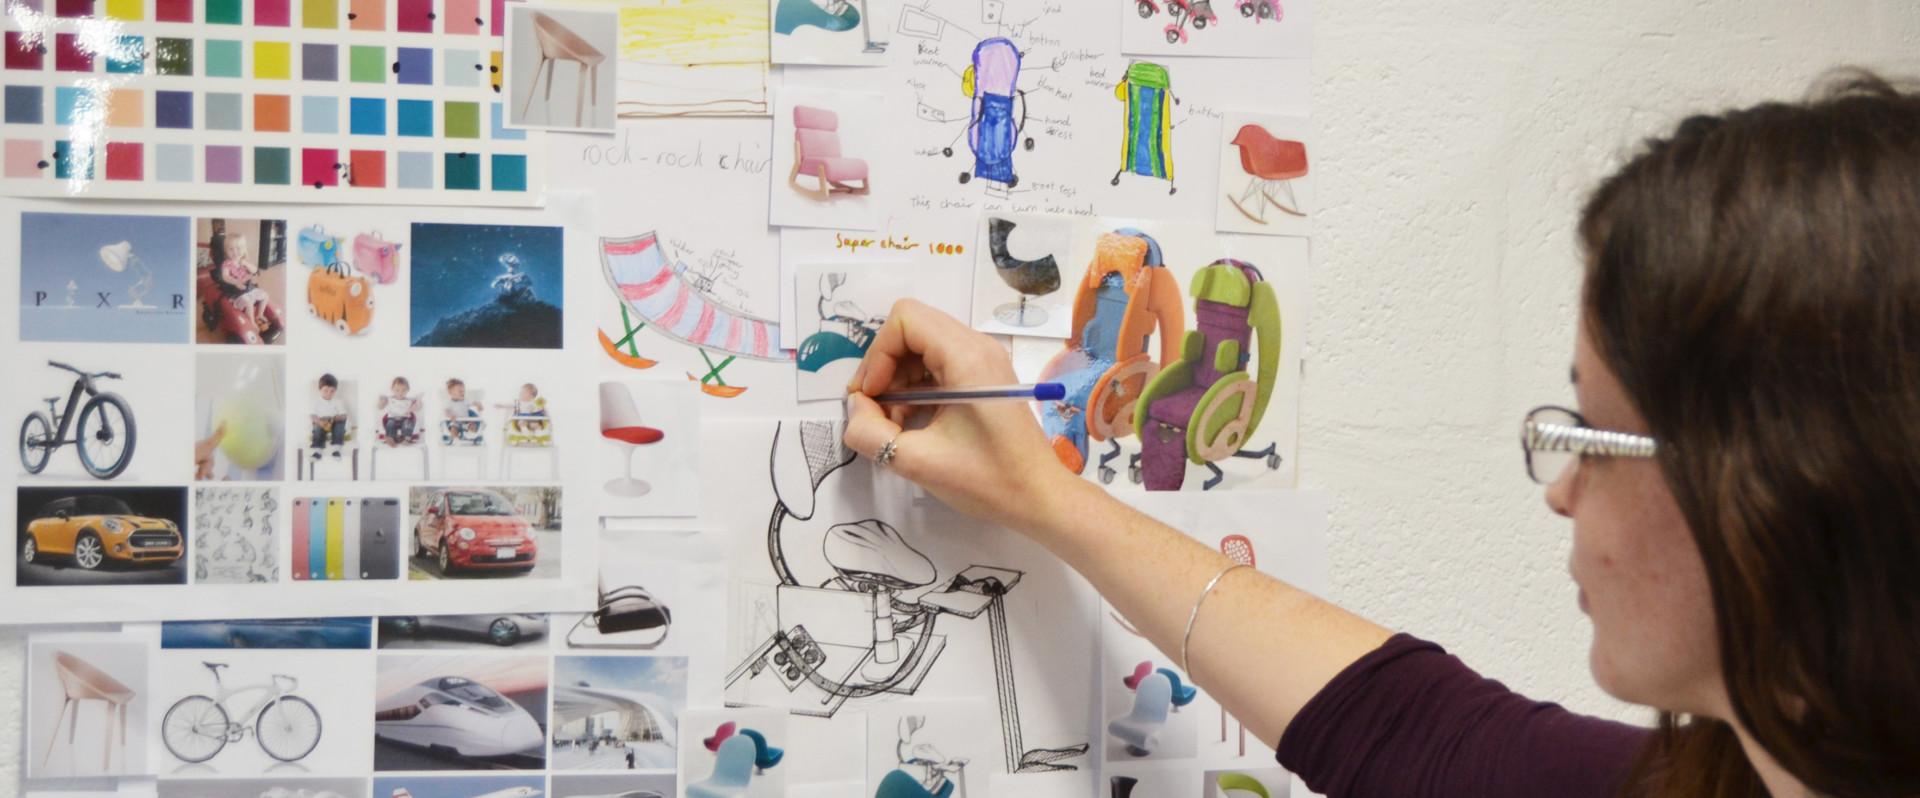 Product designer sketching